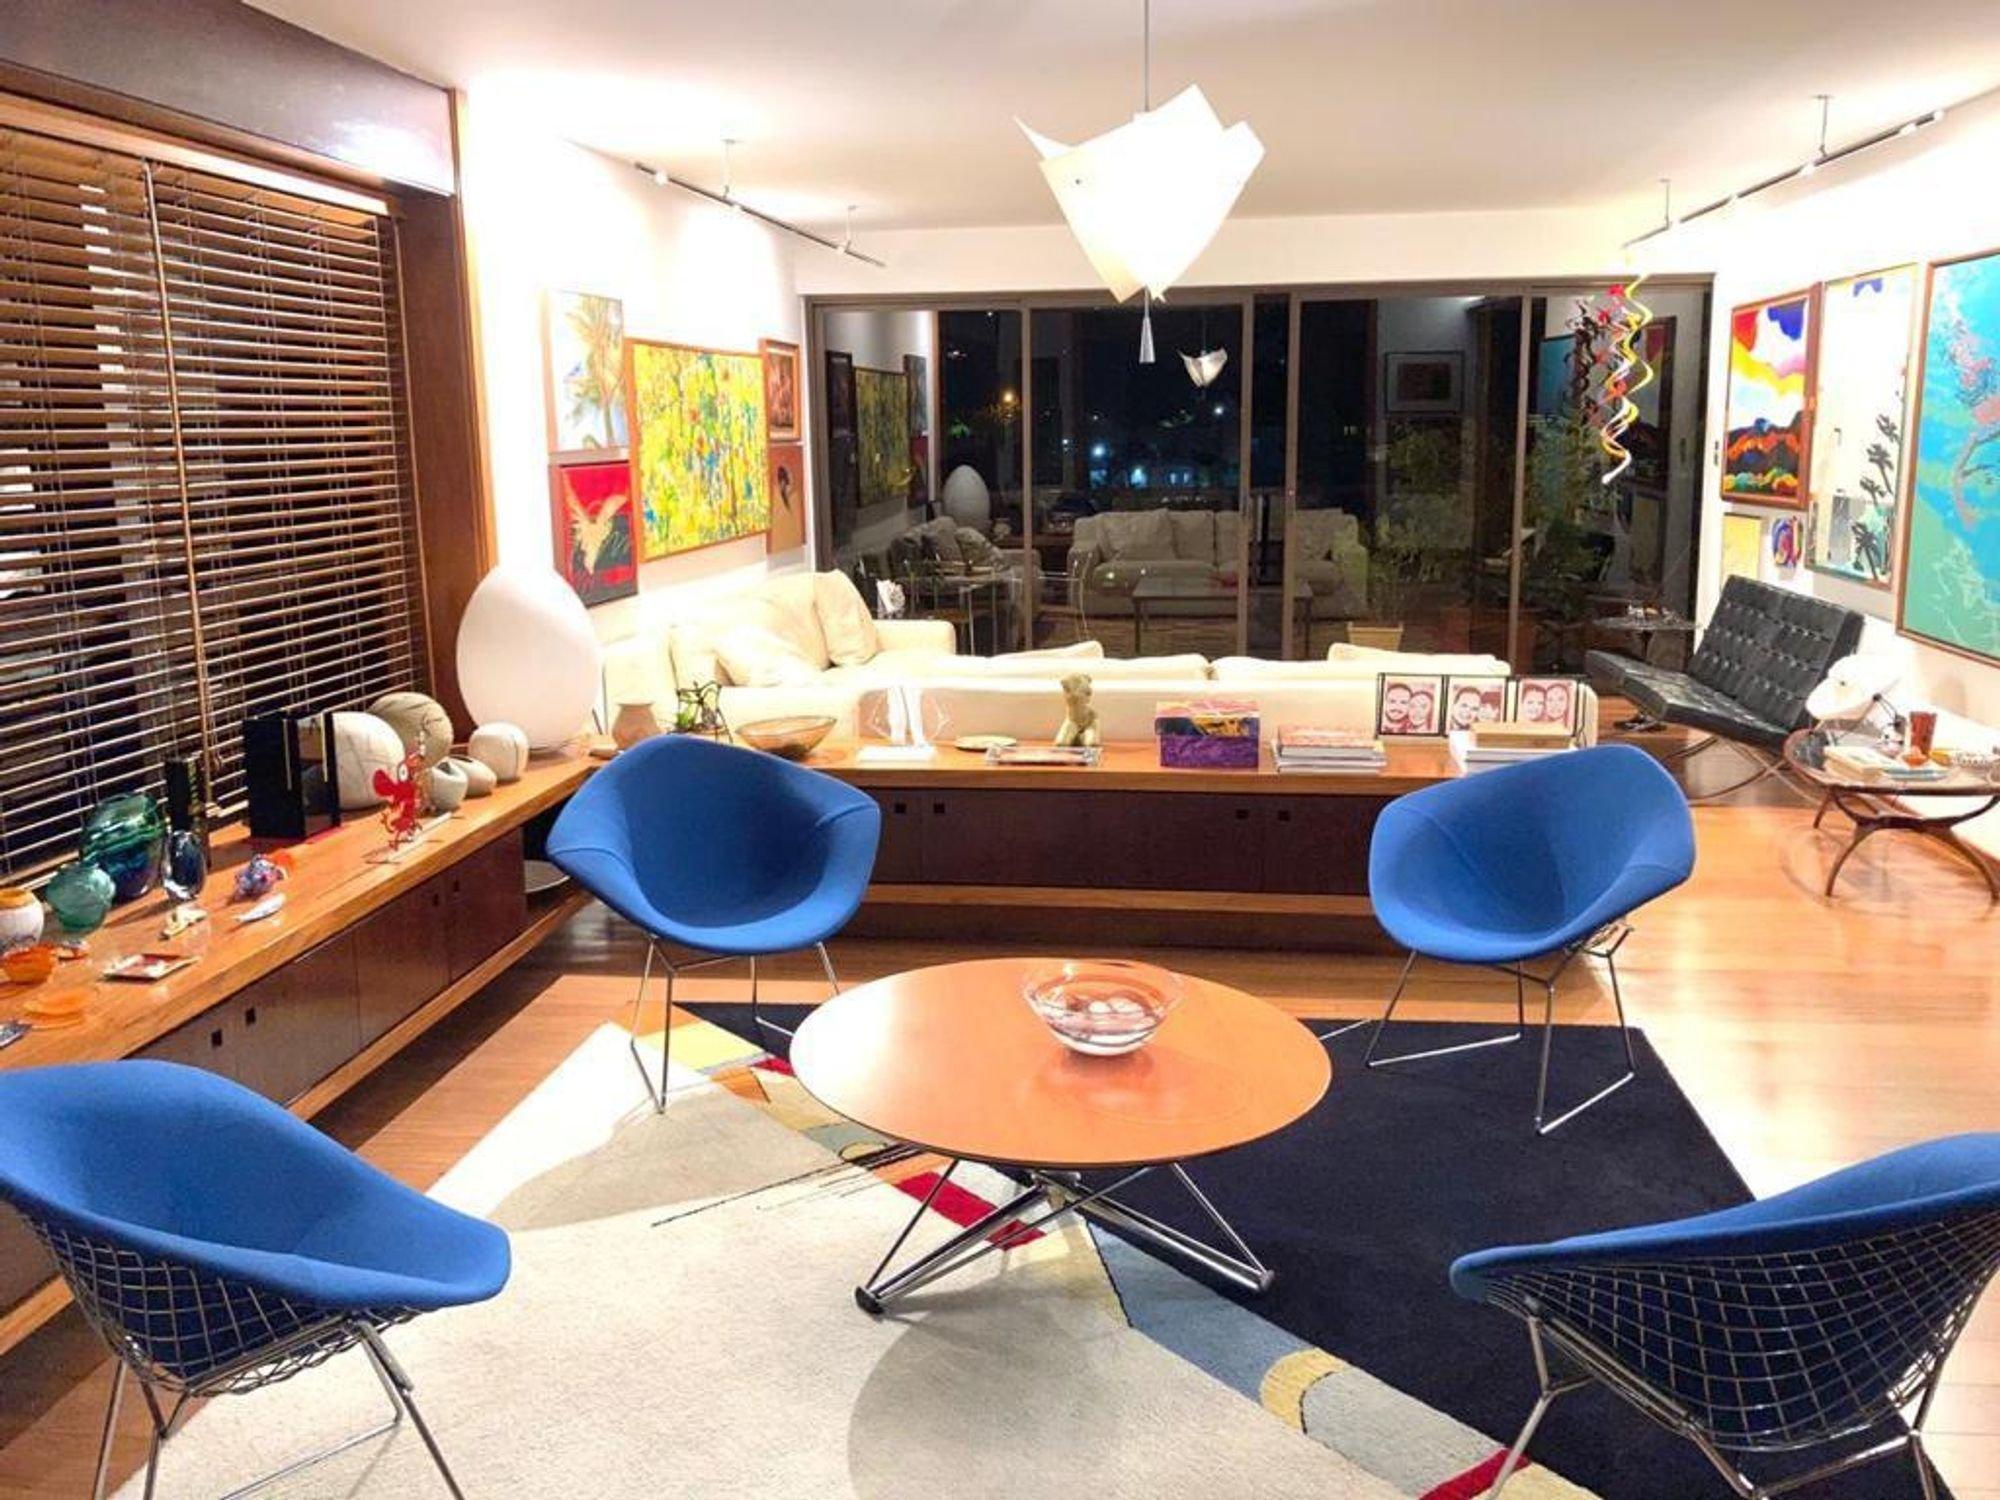 Foto de Sala com vaso de planta, copo de vinho, sofá, vaso, tigela, cadeira